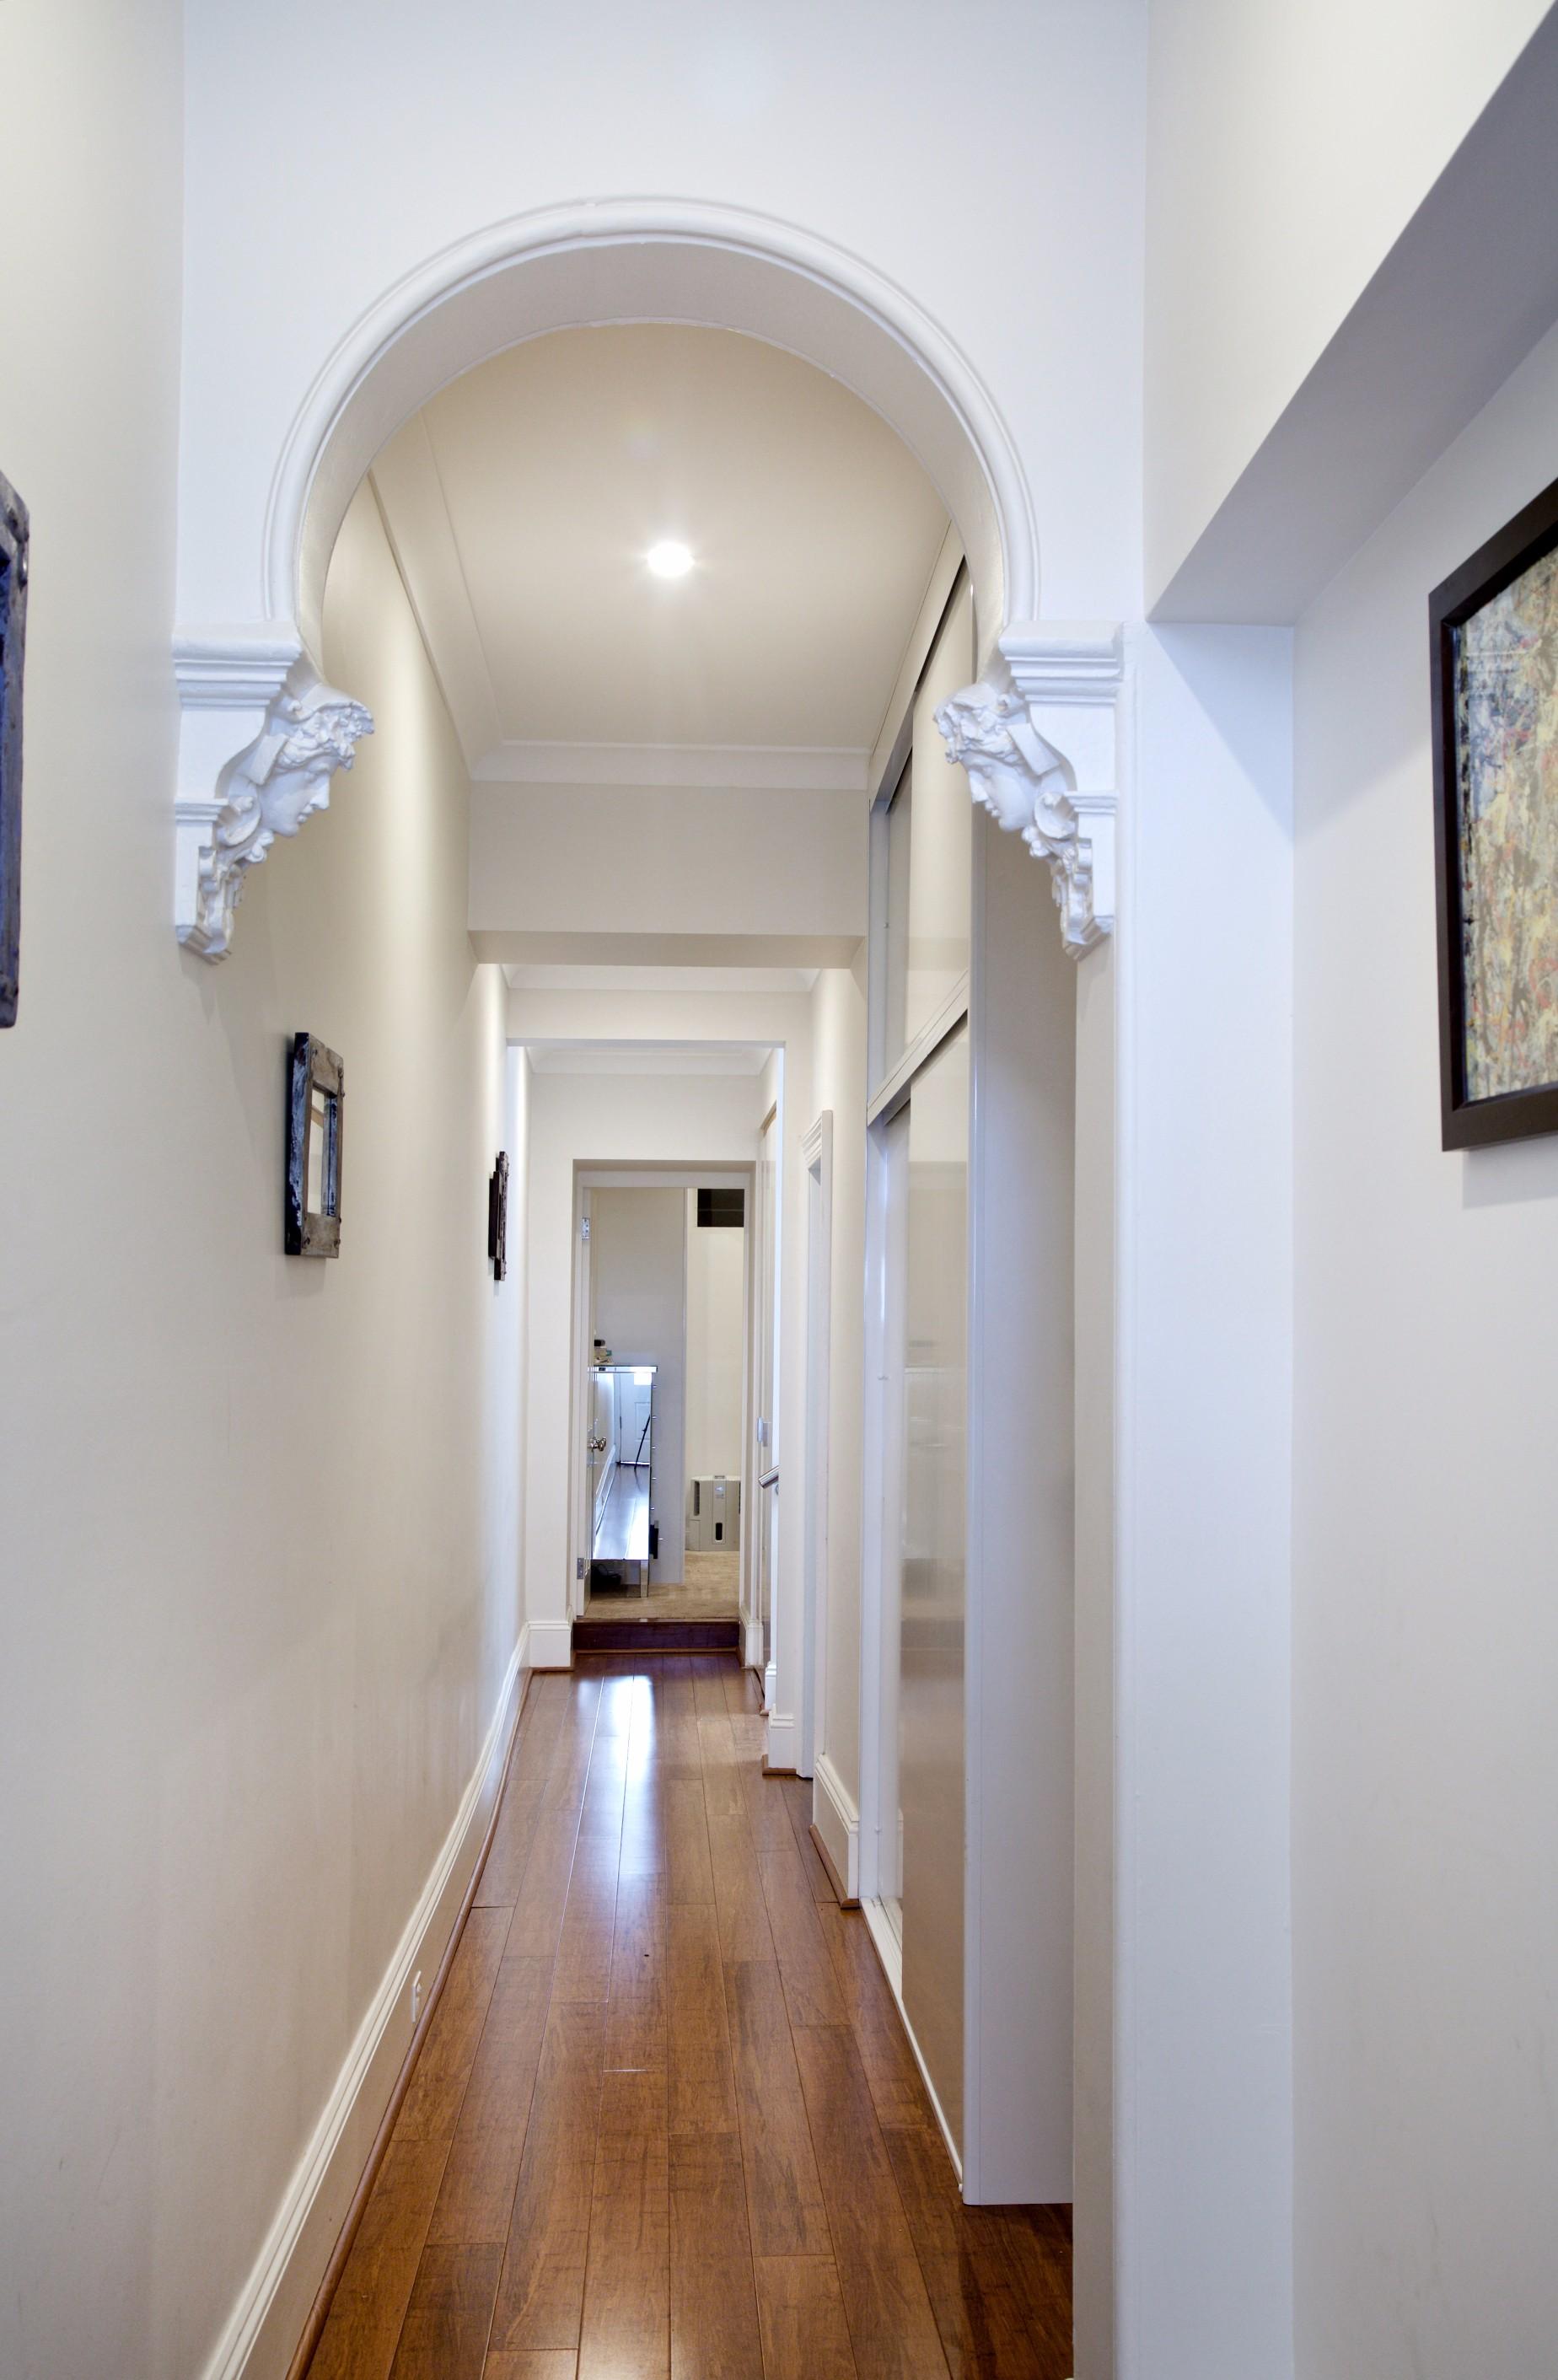 Nvisage_Custom_Design_Homes_Alterations_Additions_Partington3.jpg